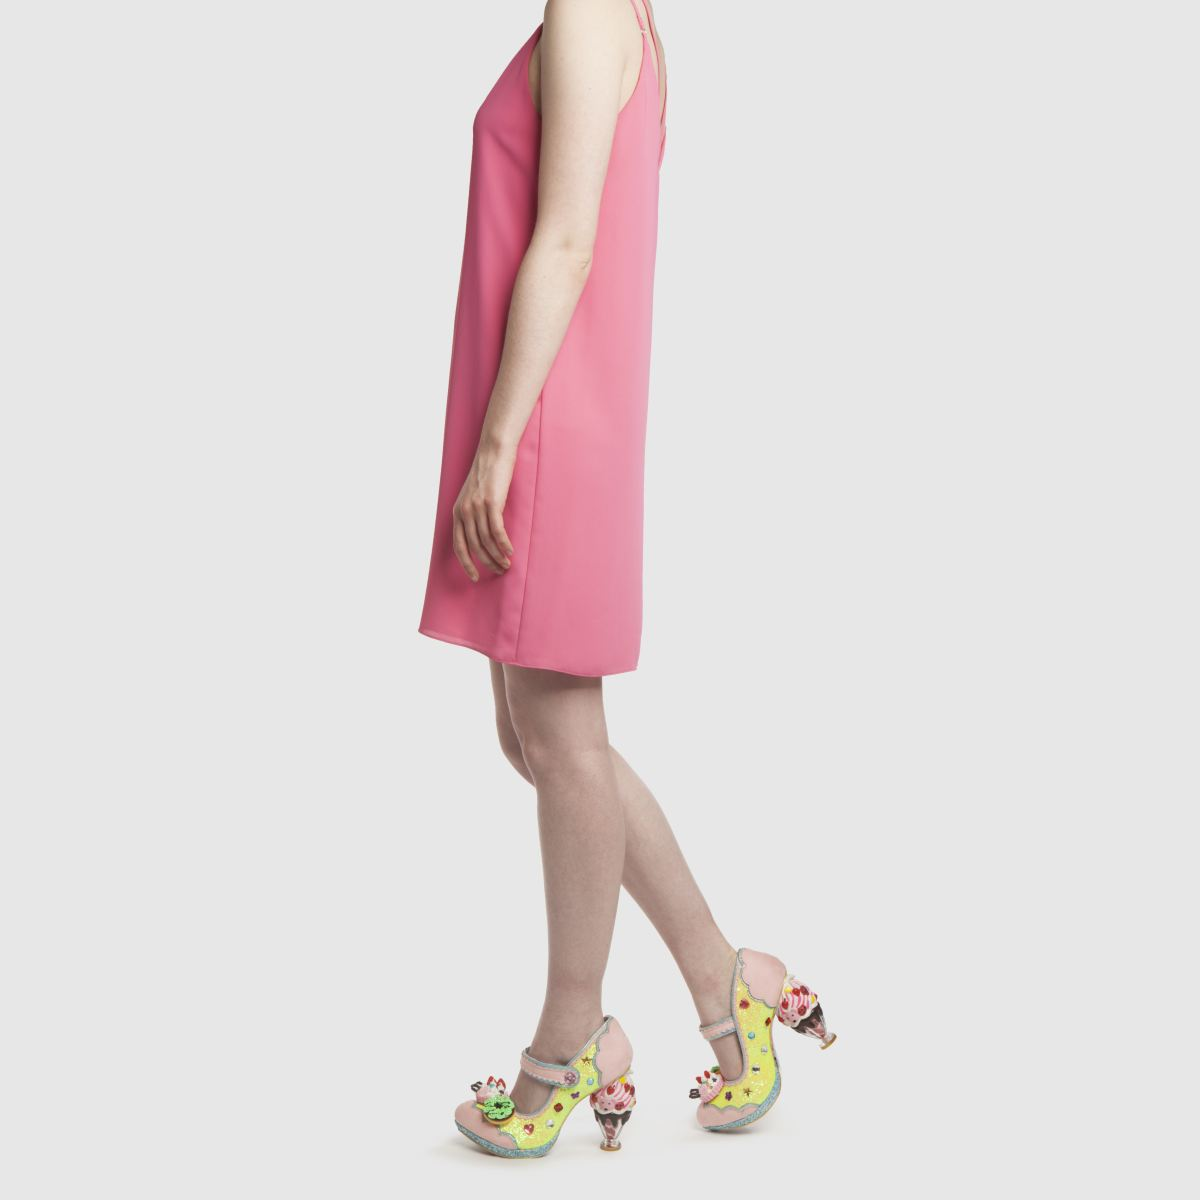 Damen Gelb-pink irregular choice Ice & A Slice High Heels | schuh Gute Qualität beliebte Schuhe